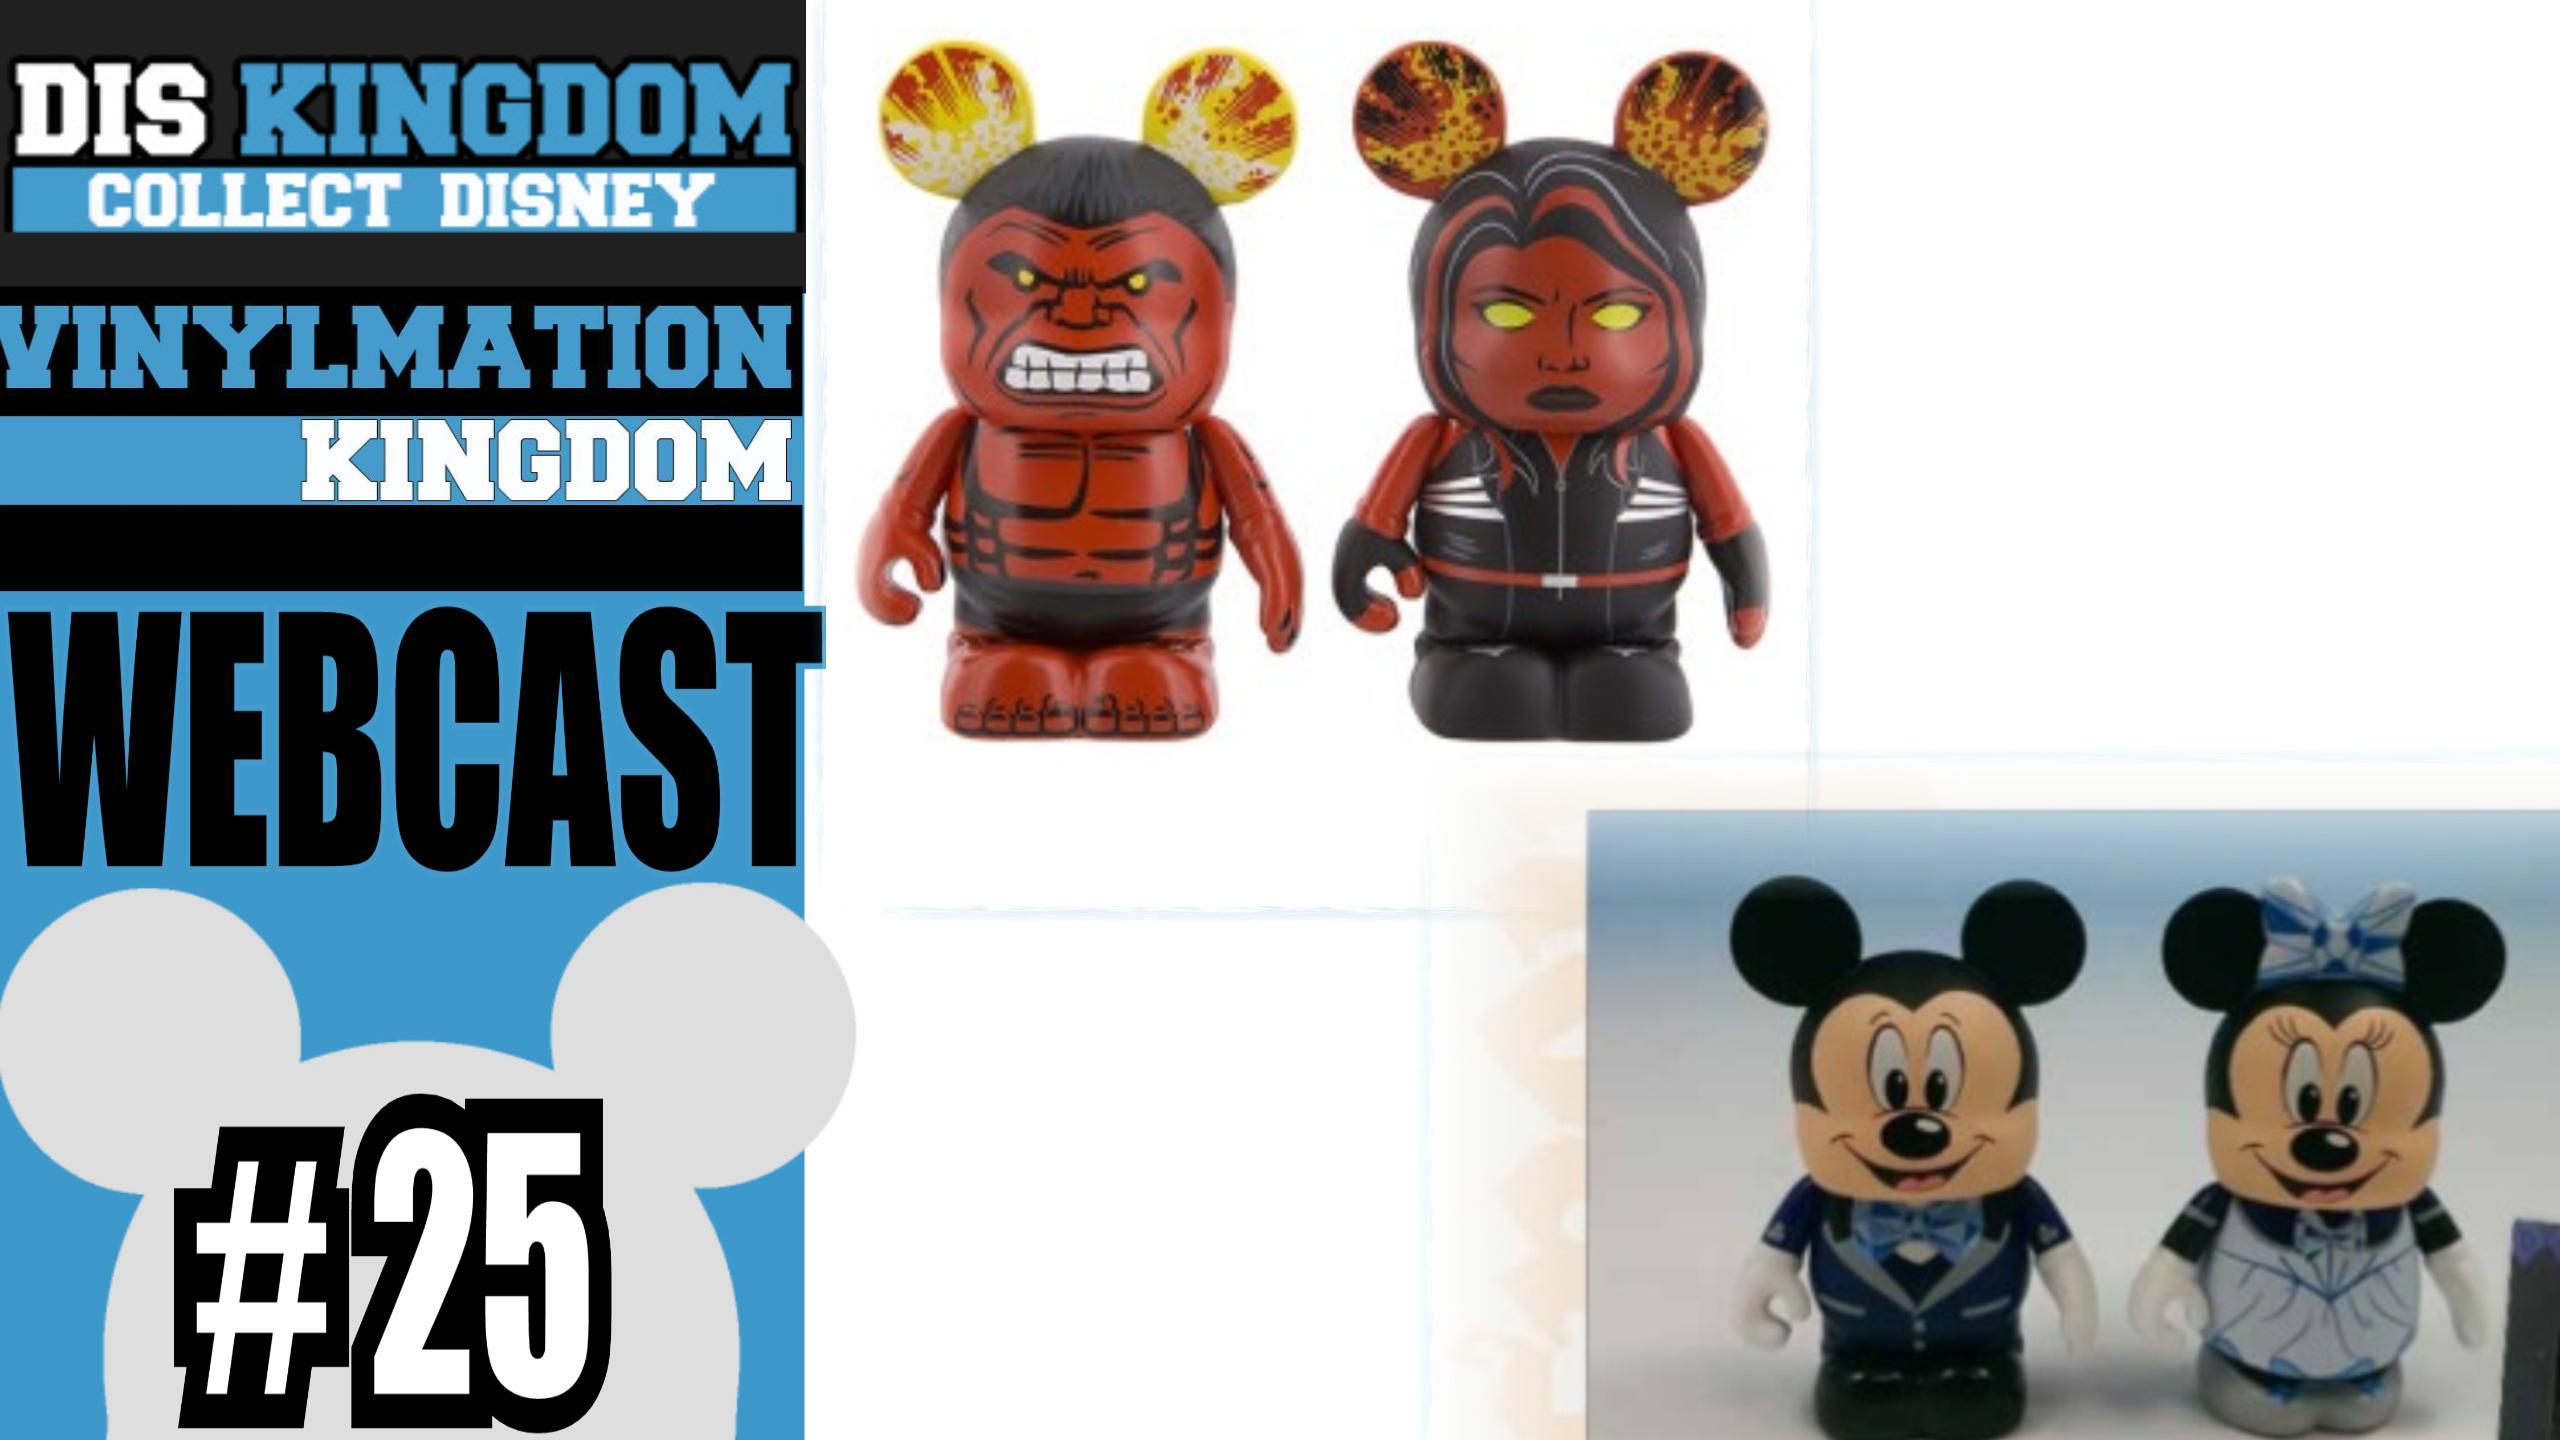 Vinylmation Kingdom Webcast 25 Red Hulks, Disneyland 60th & More